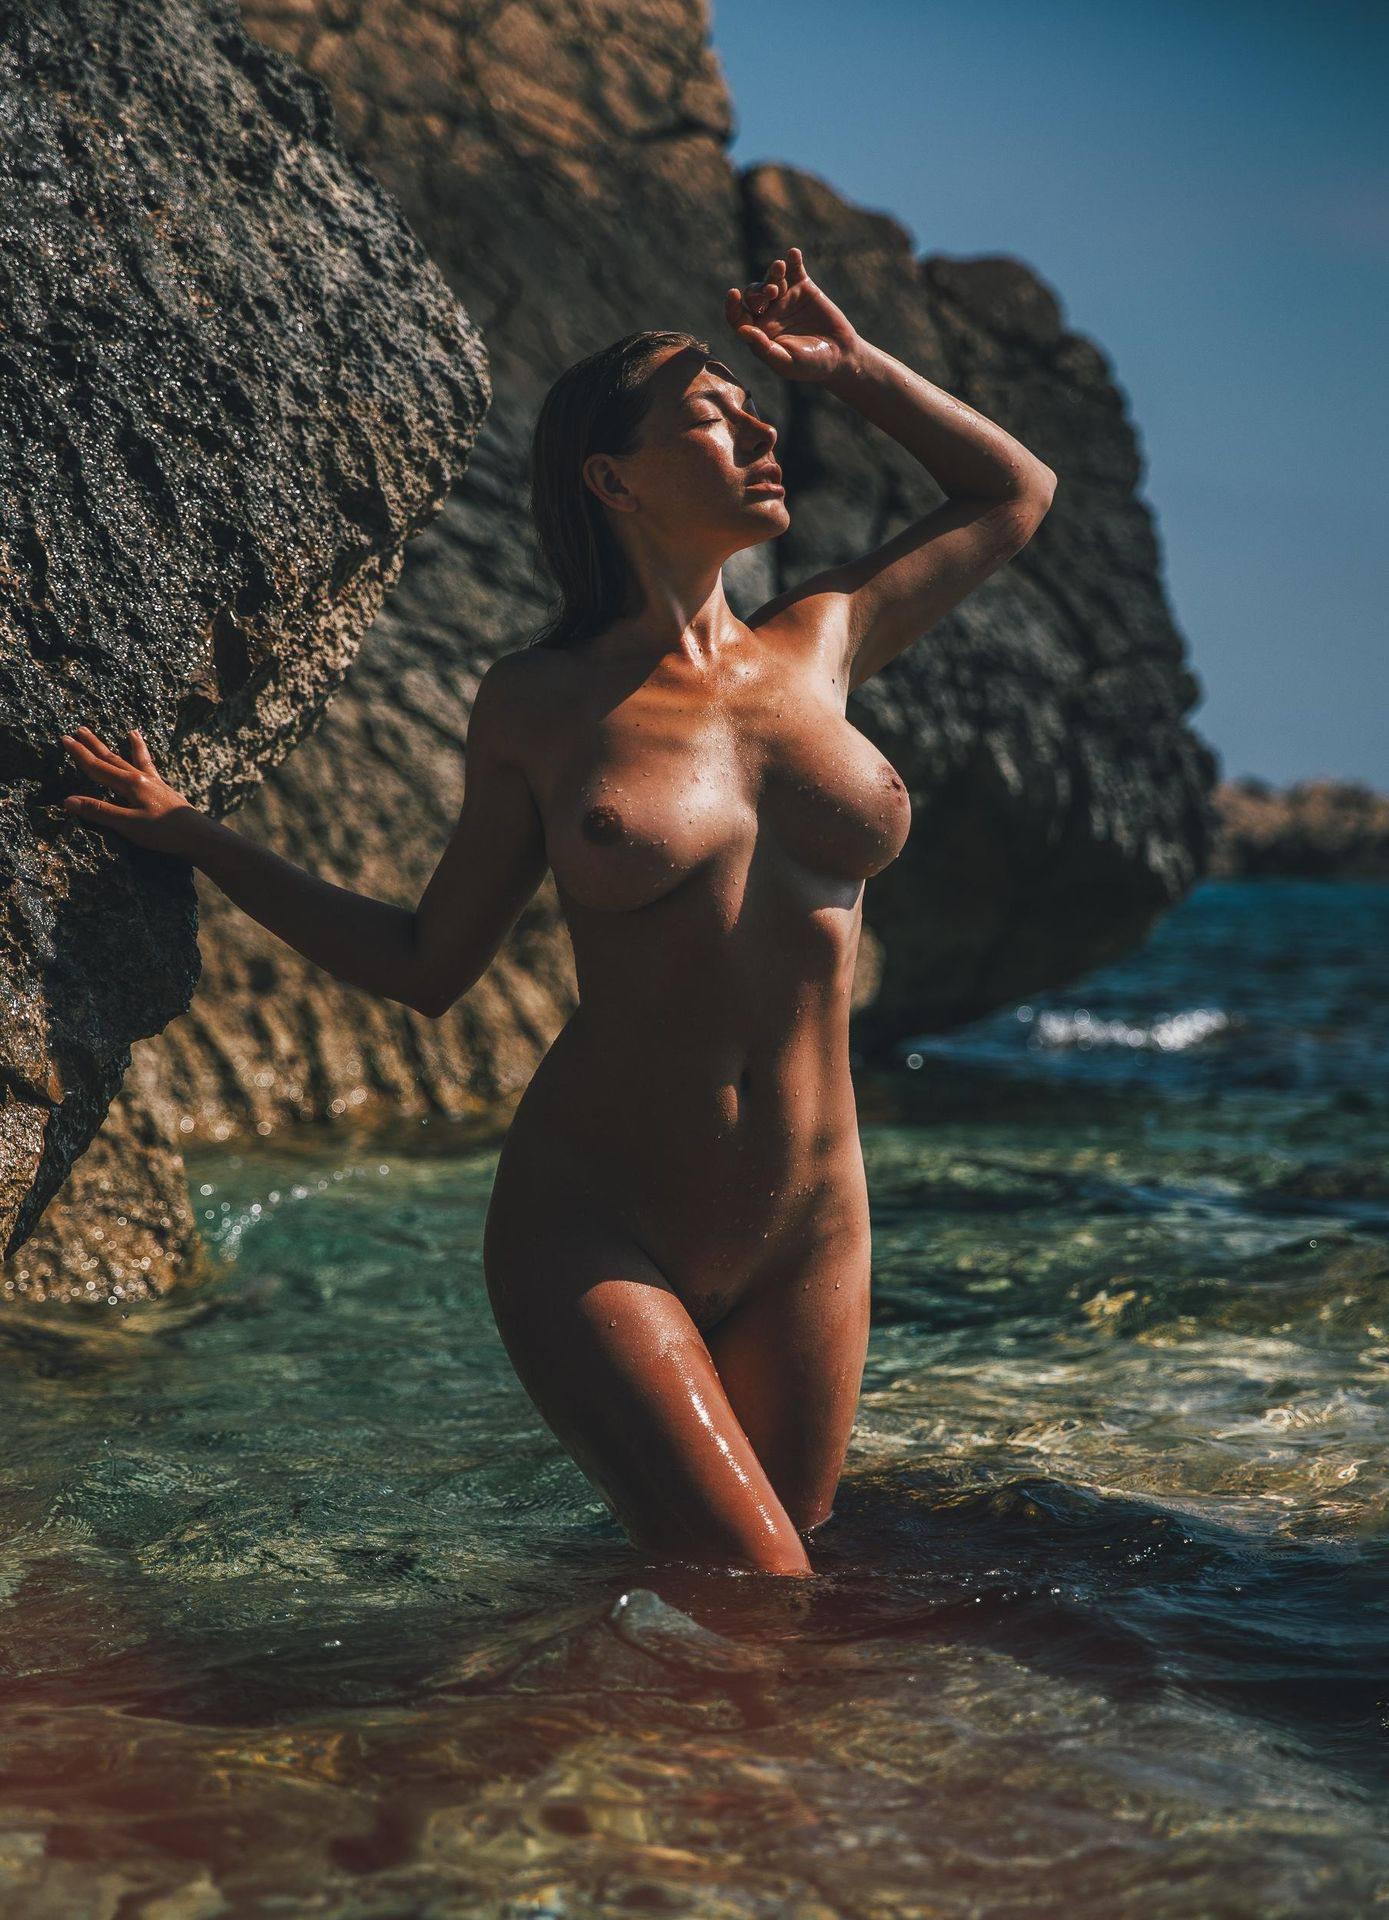 Olga Kobzar – Hot Big Boobs In Sexy Full Frontal Nude Photoshoot By Thomas Agatz (nsfw) 0019